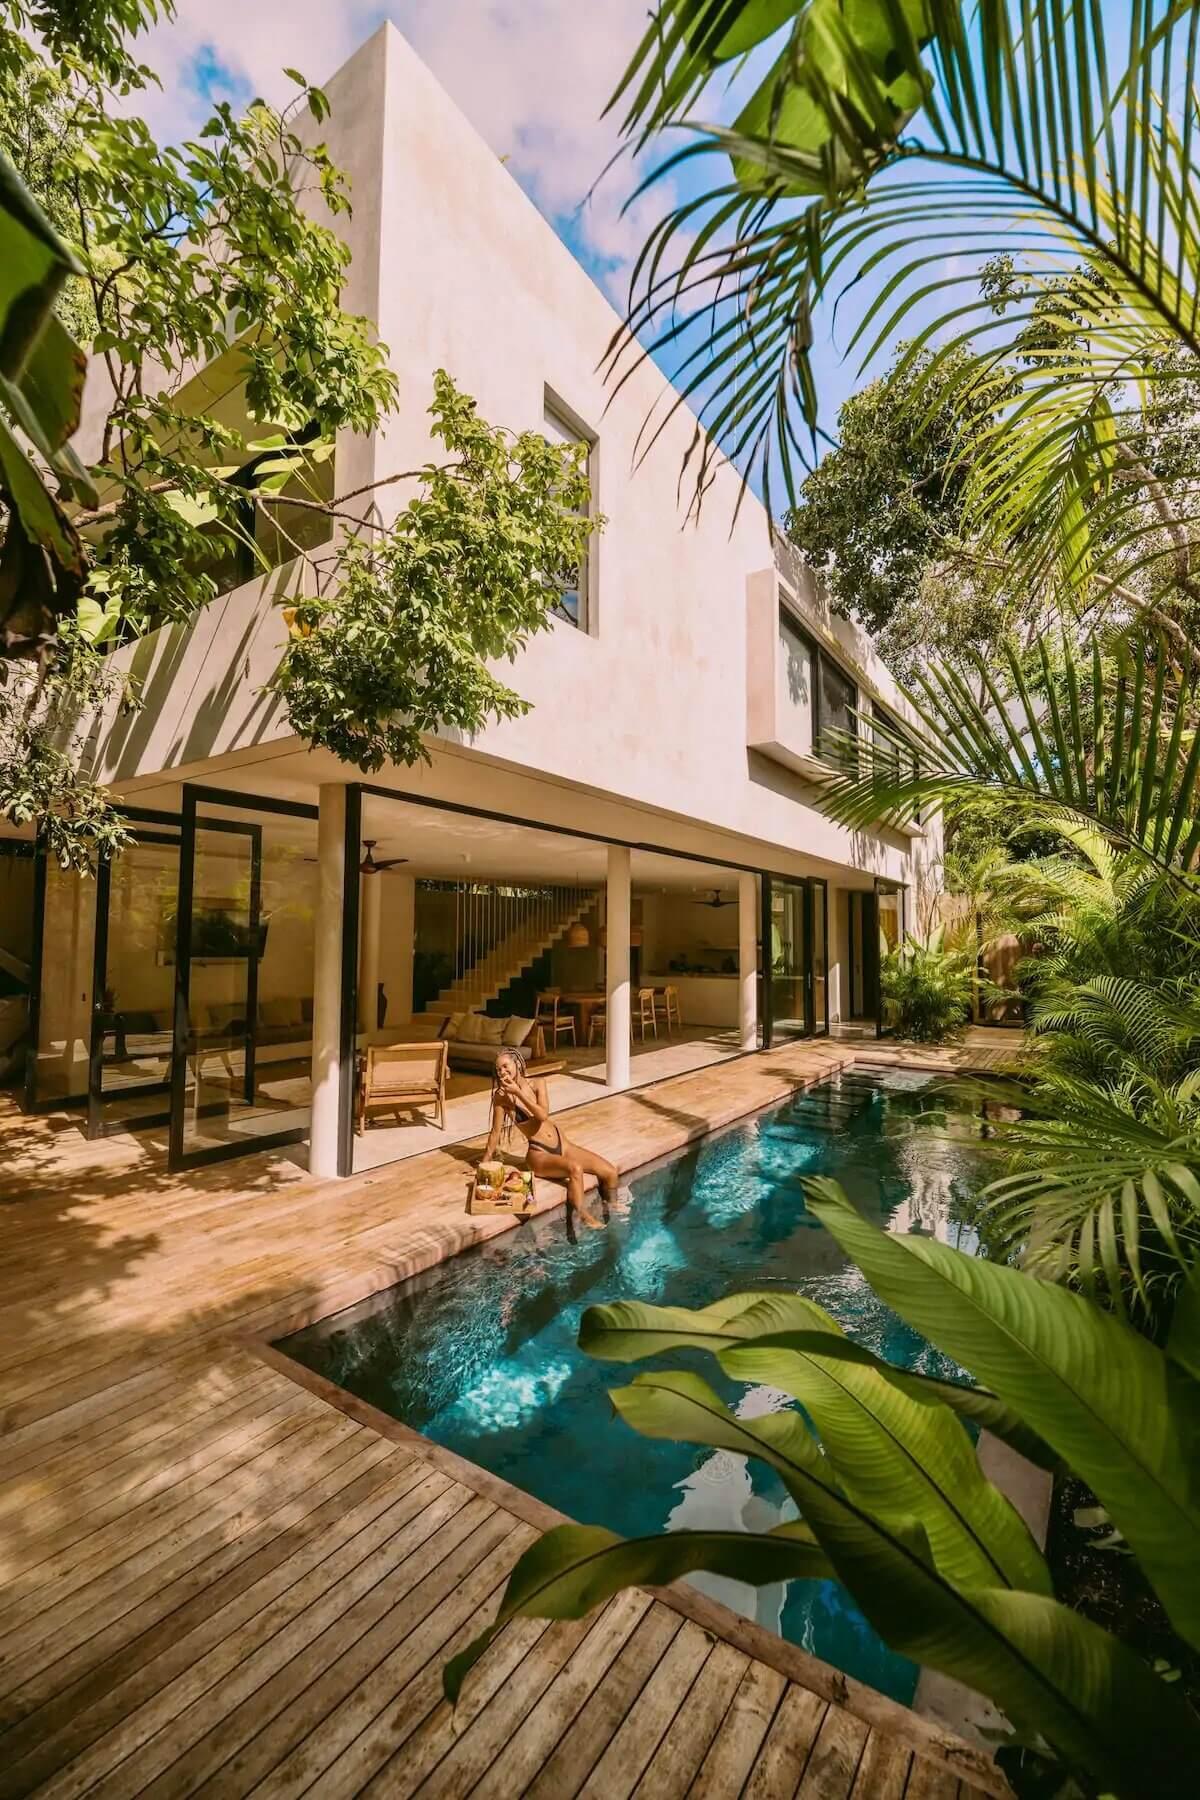 Casa Areca | A Luxurious Eco-Friendly Airbnb Villa in Tulum